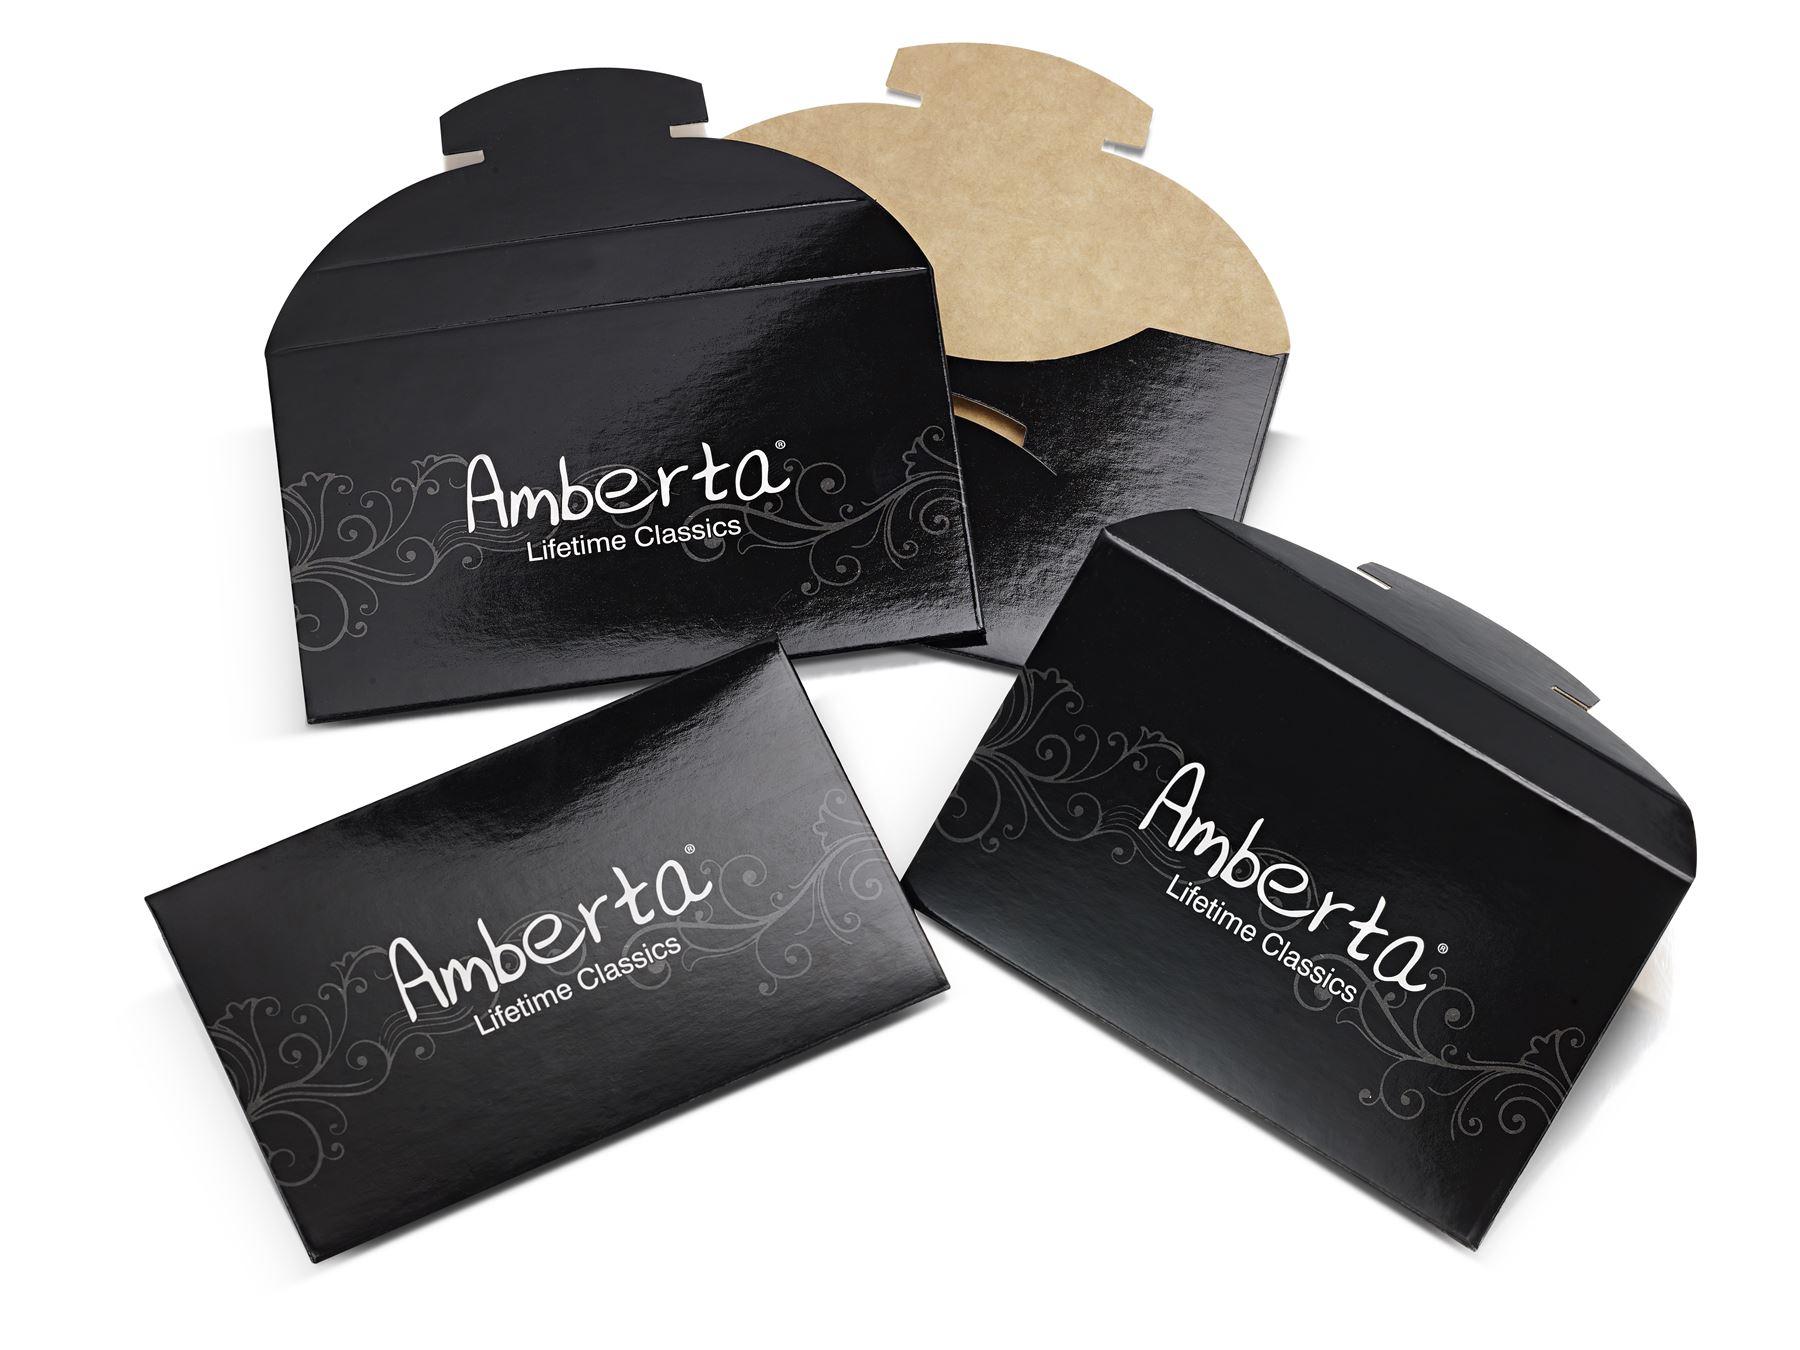 Amberta-Jewelry-925-Sterling-Silver-Adjustable-Bracelet-Italian-Bangle-for-Women thumbnail 25